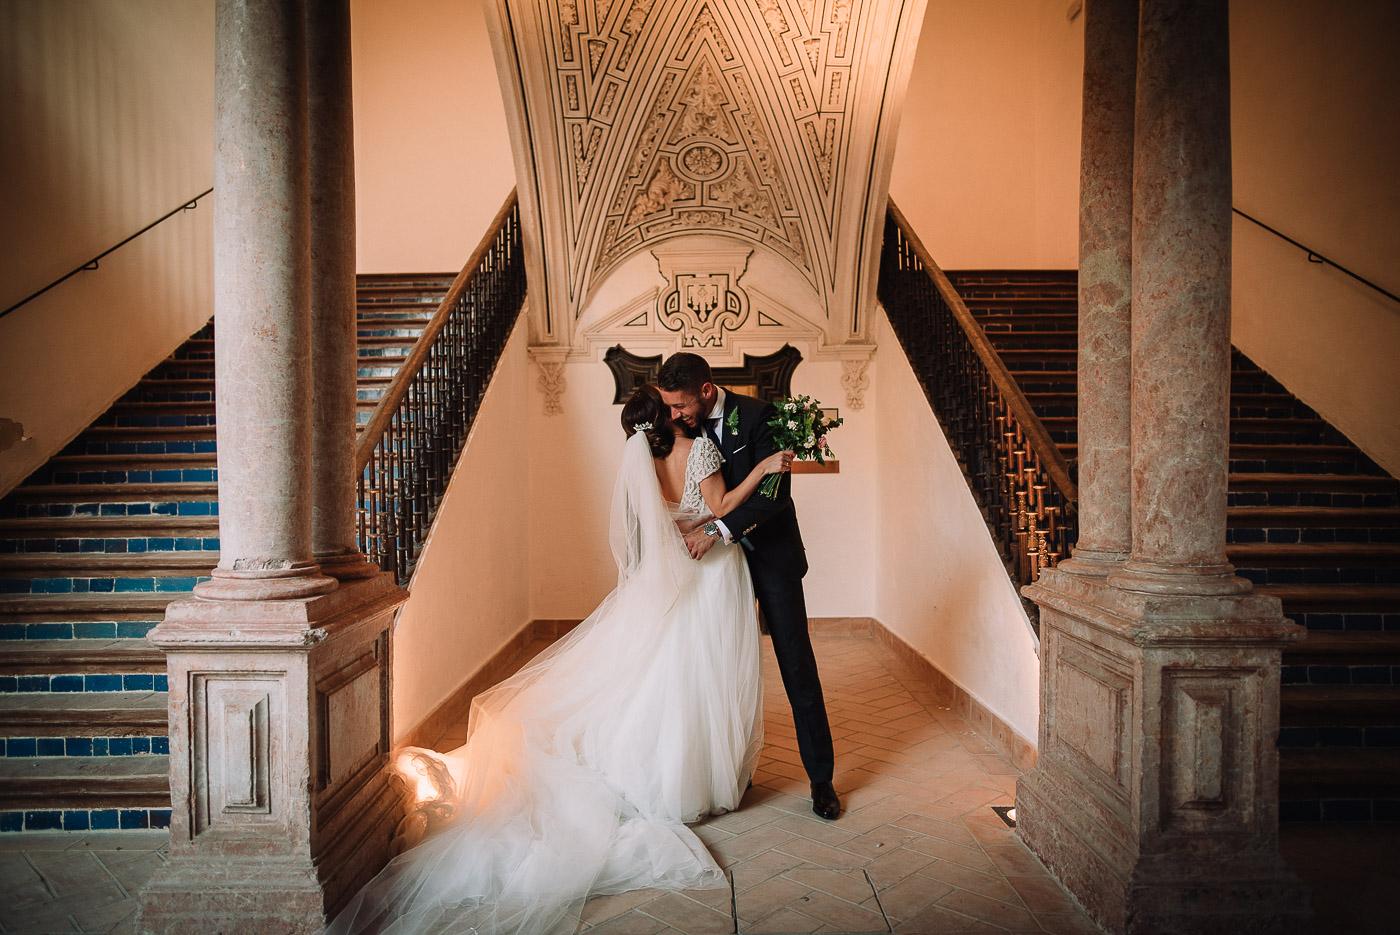 otografo-bodas-sevilla-boda-santa-maria-sargenta-manuel-fijo